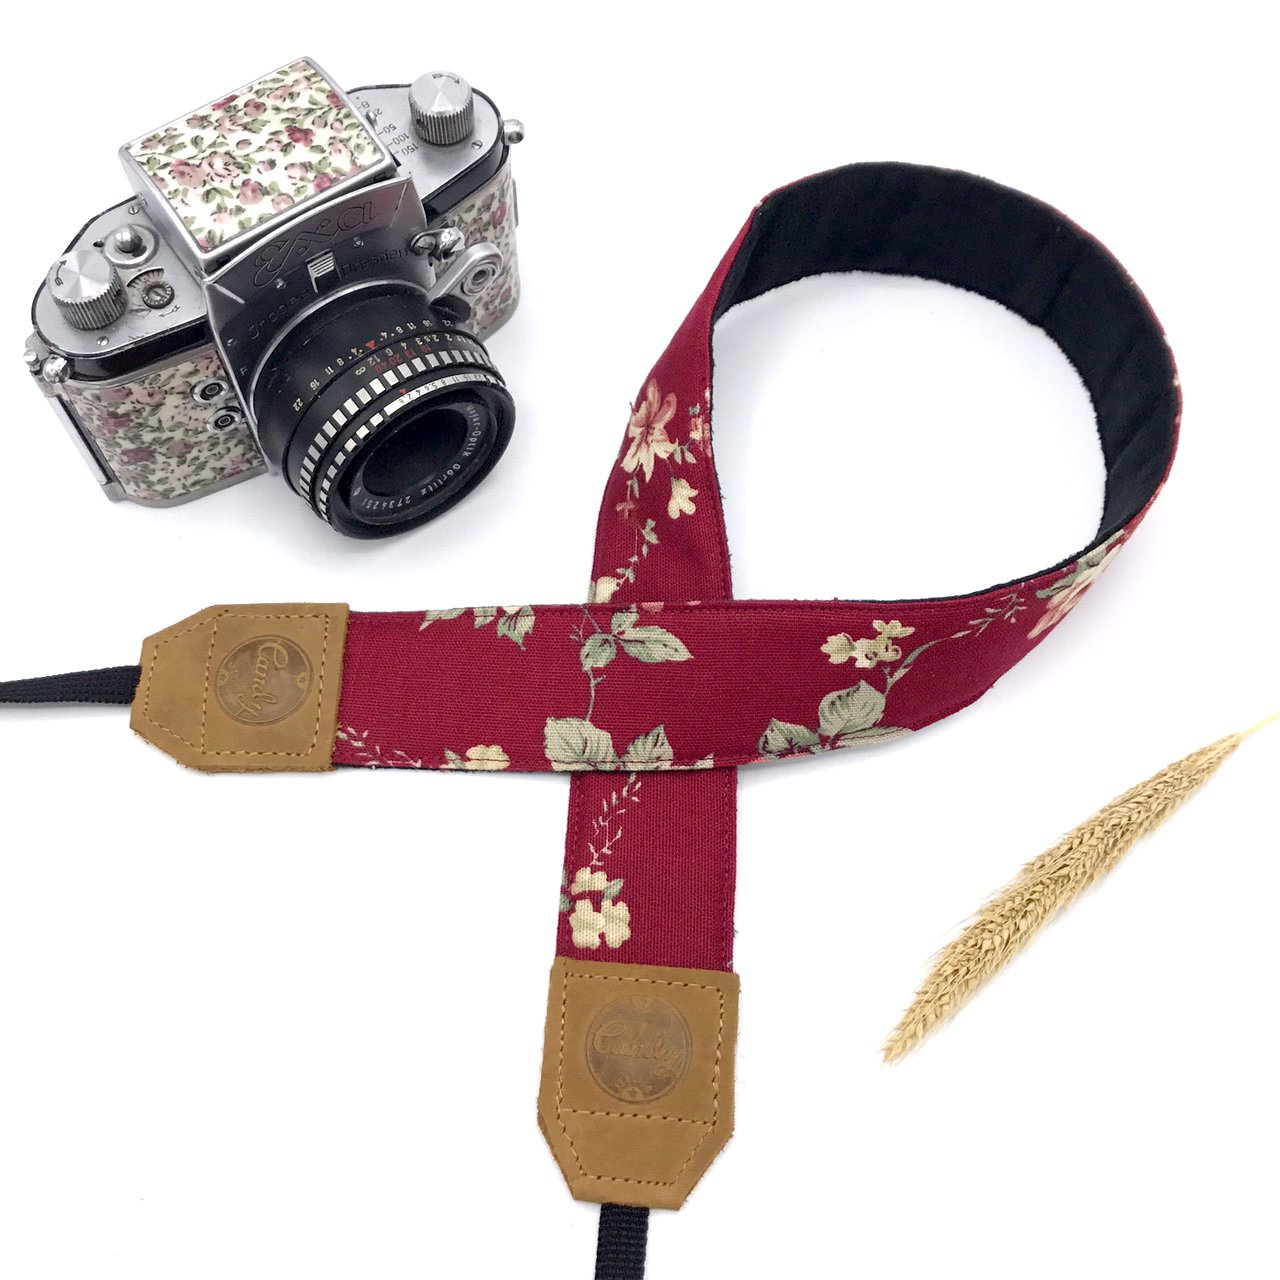 PresonalizedレッドFloraカメラストラップ、キャンディレザーDSLRカメラストラップ、本革カメラストラップ、ギフトfor Her   B07CYW6Q9Z